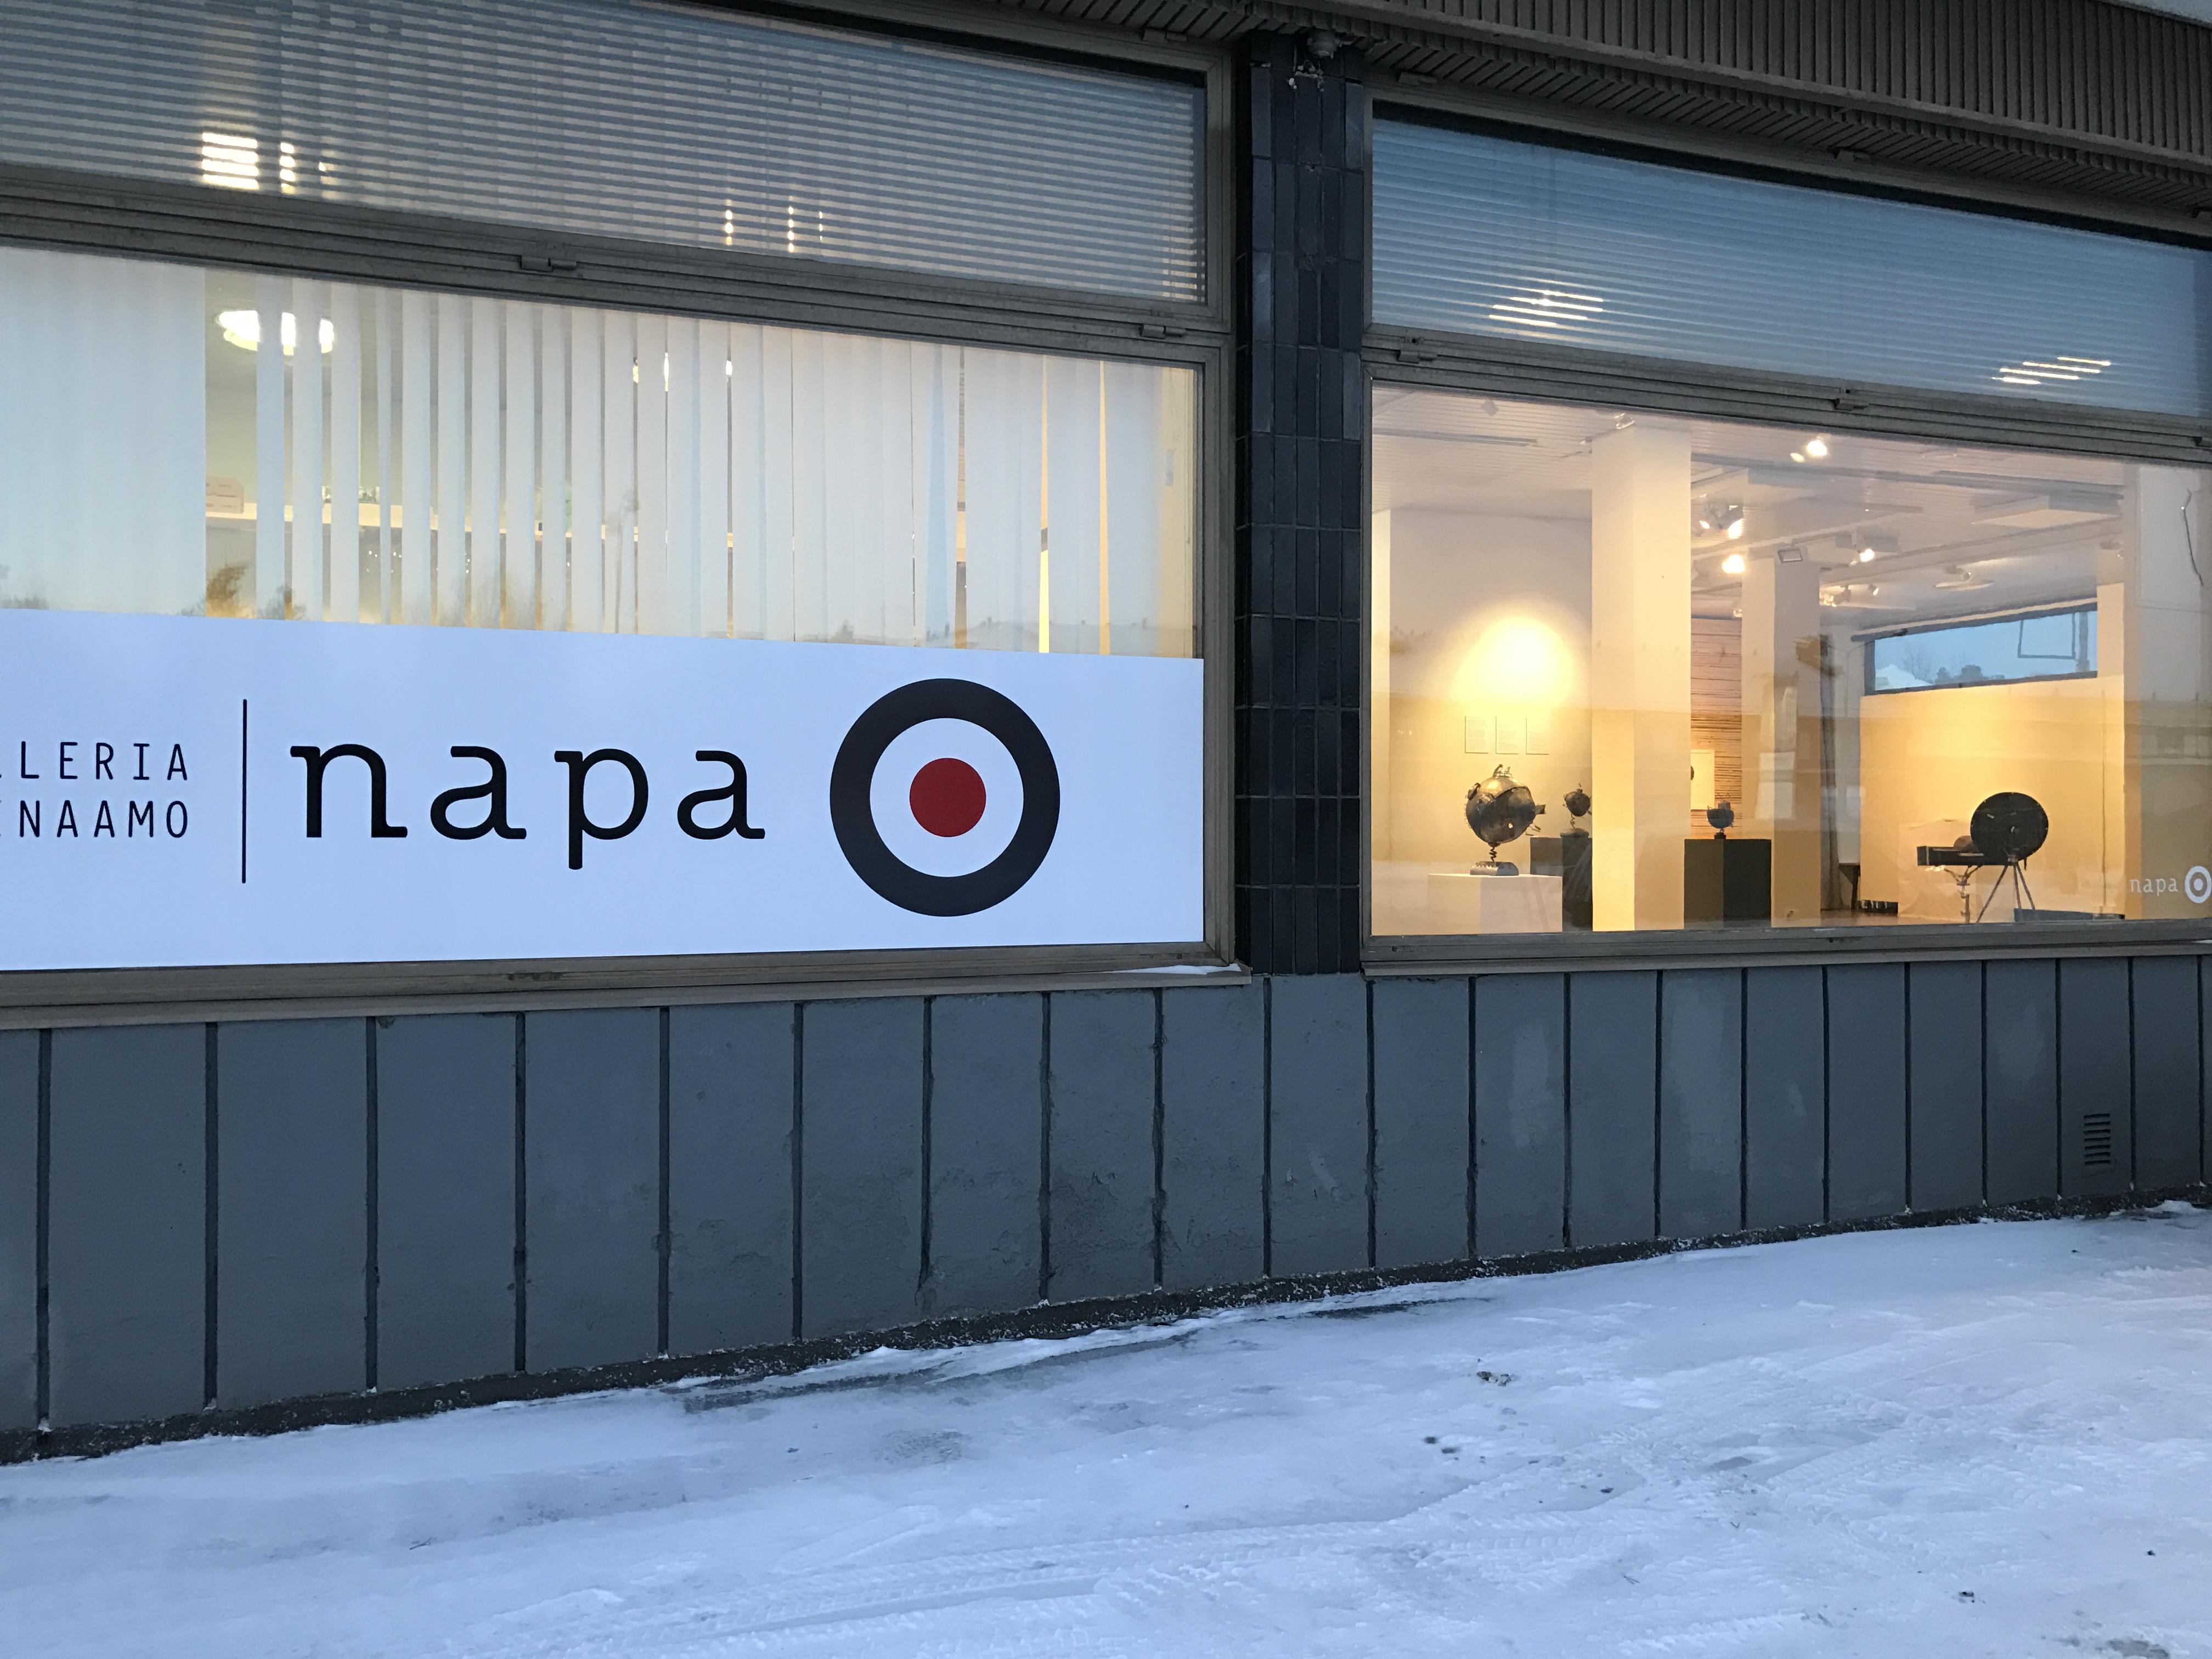 Gallery napa in Rovaniemi